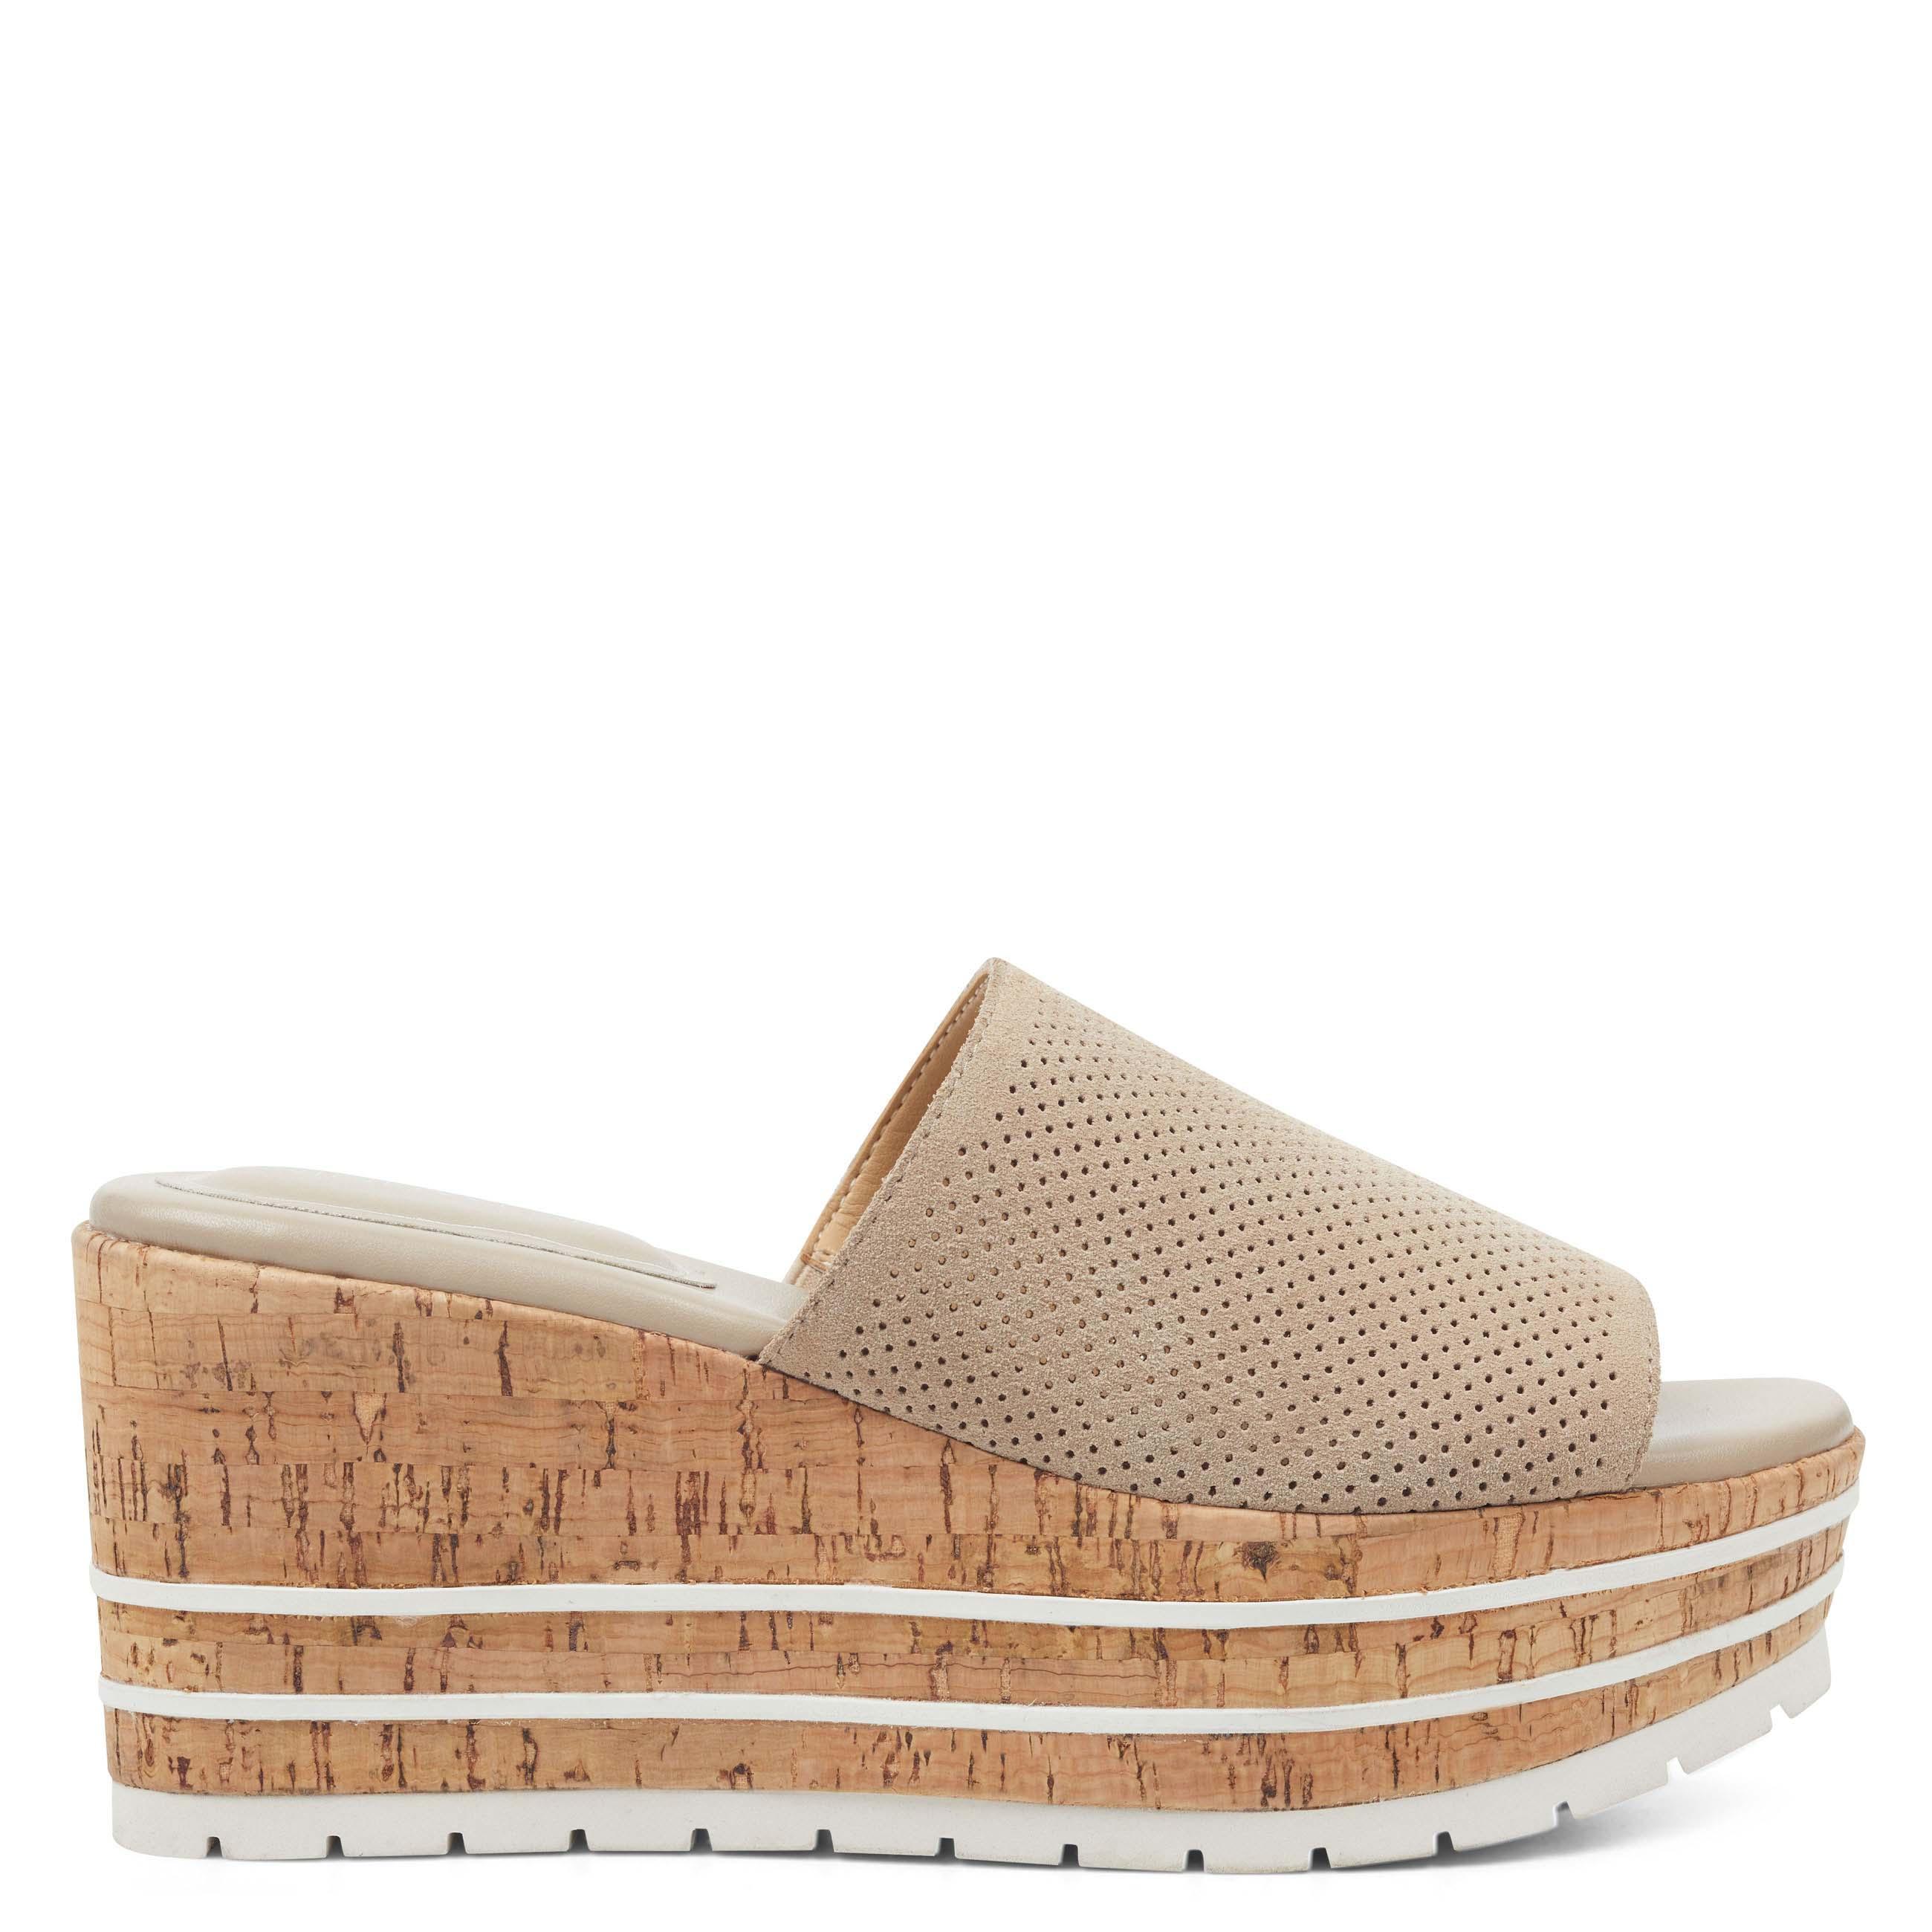 3da91633120b Lyst - Nine West Reagan Platform Sandals in Natural